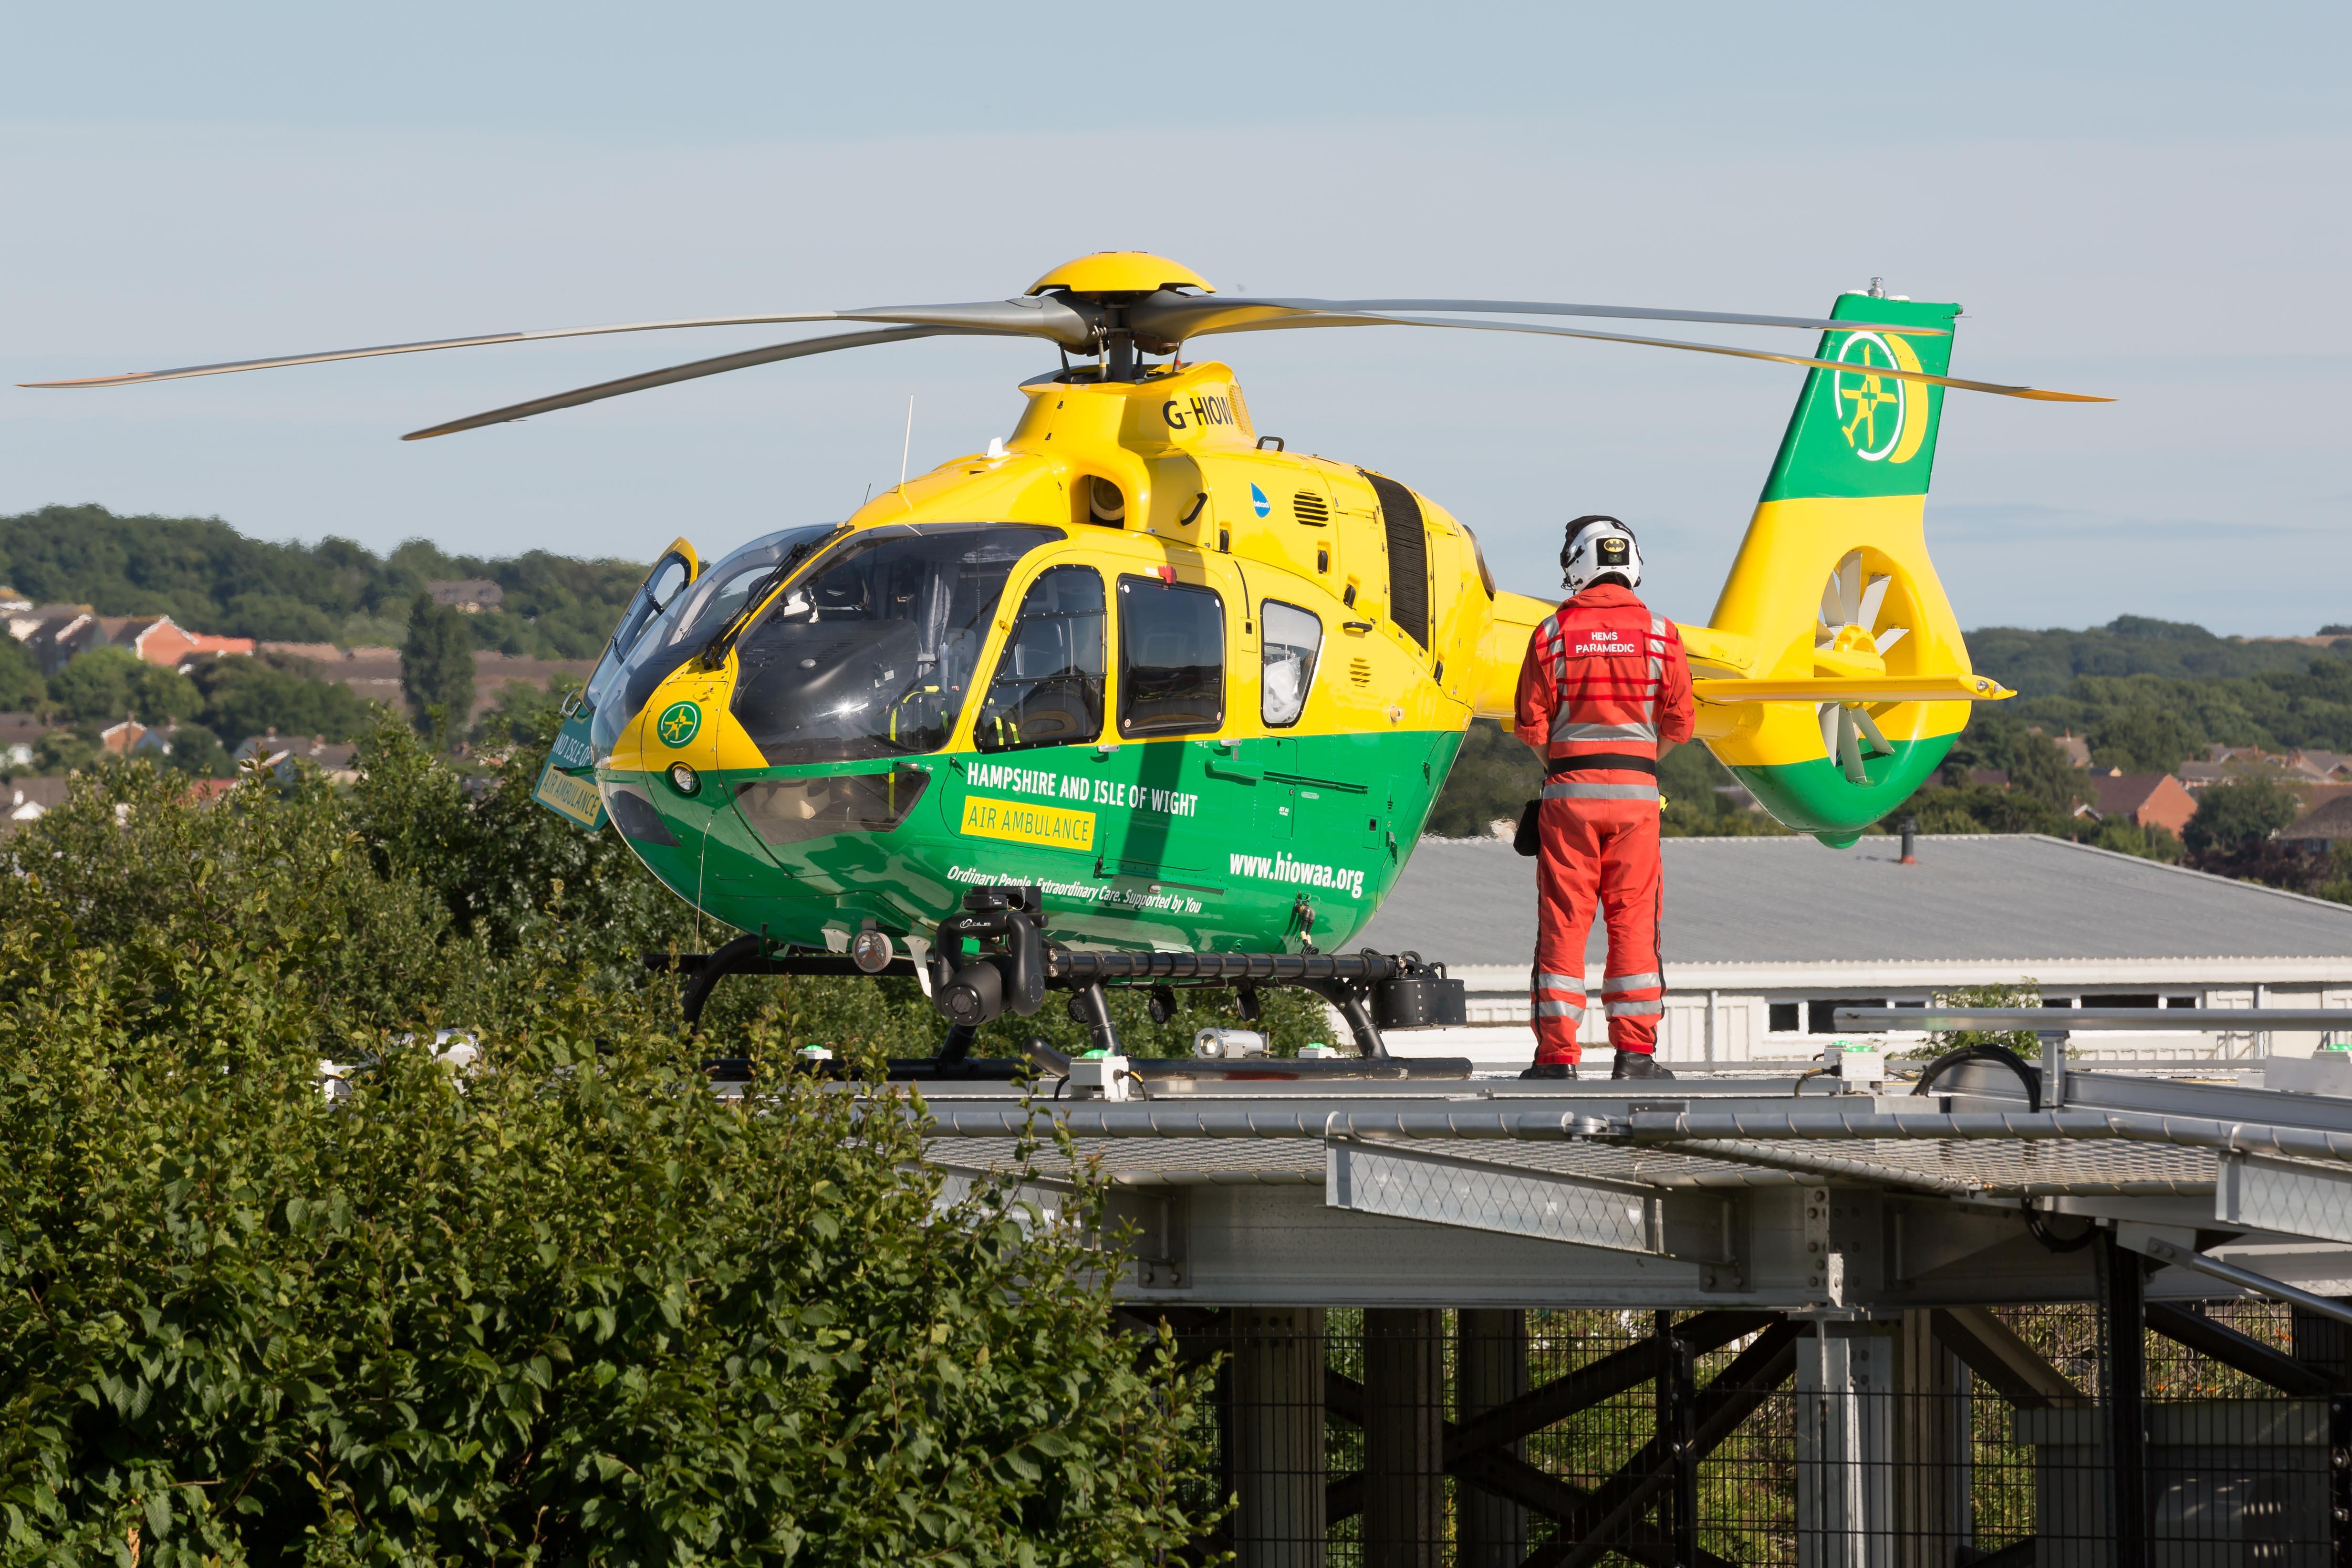 Legacies Hampshire And Isle Of Wight Air Ambulance